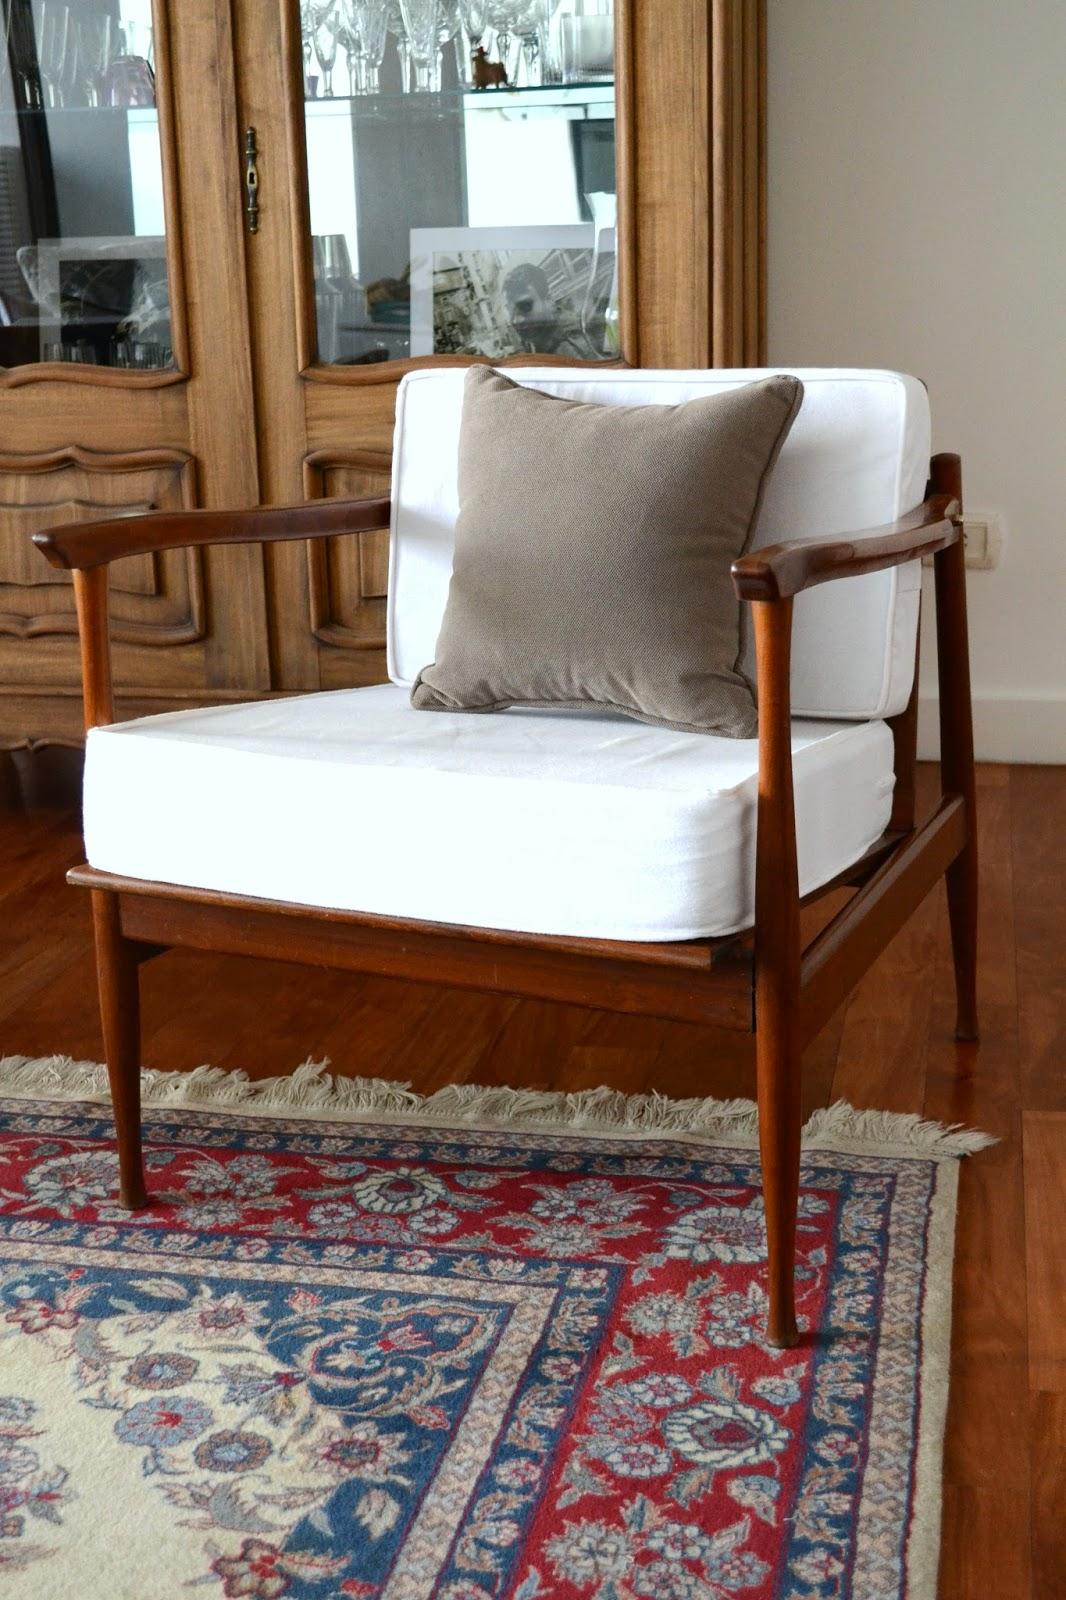 alma deco buenos aires octubre 2014. Black Bedroom Furniture Sets. Home Design Ideas